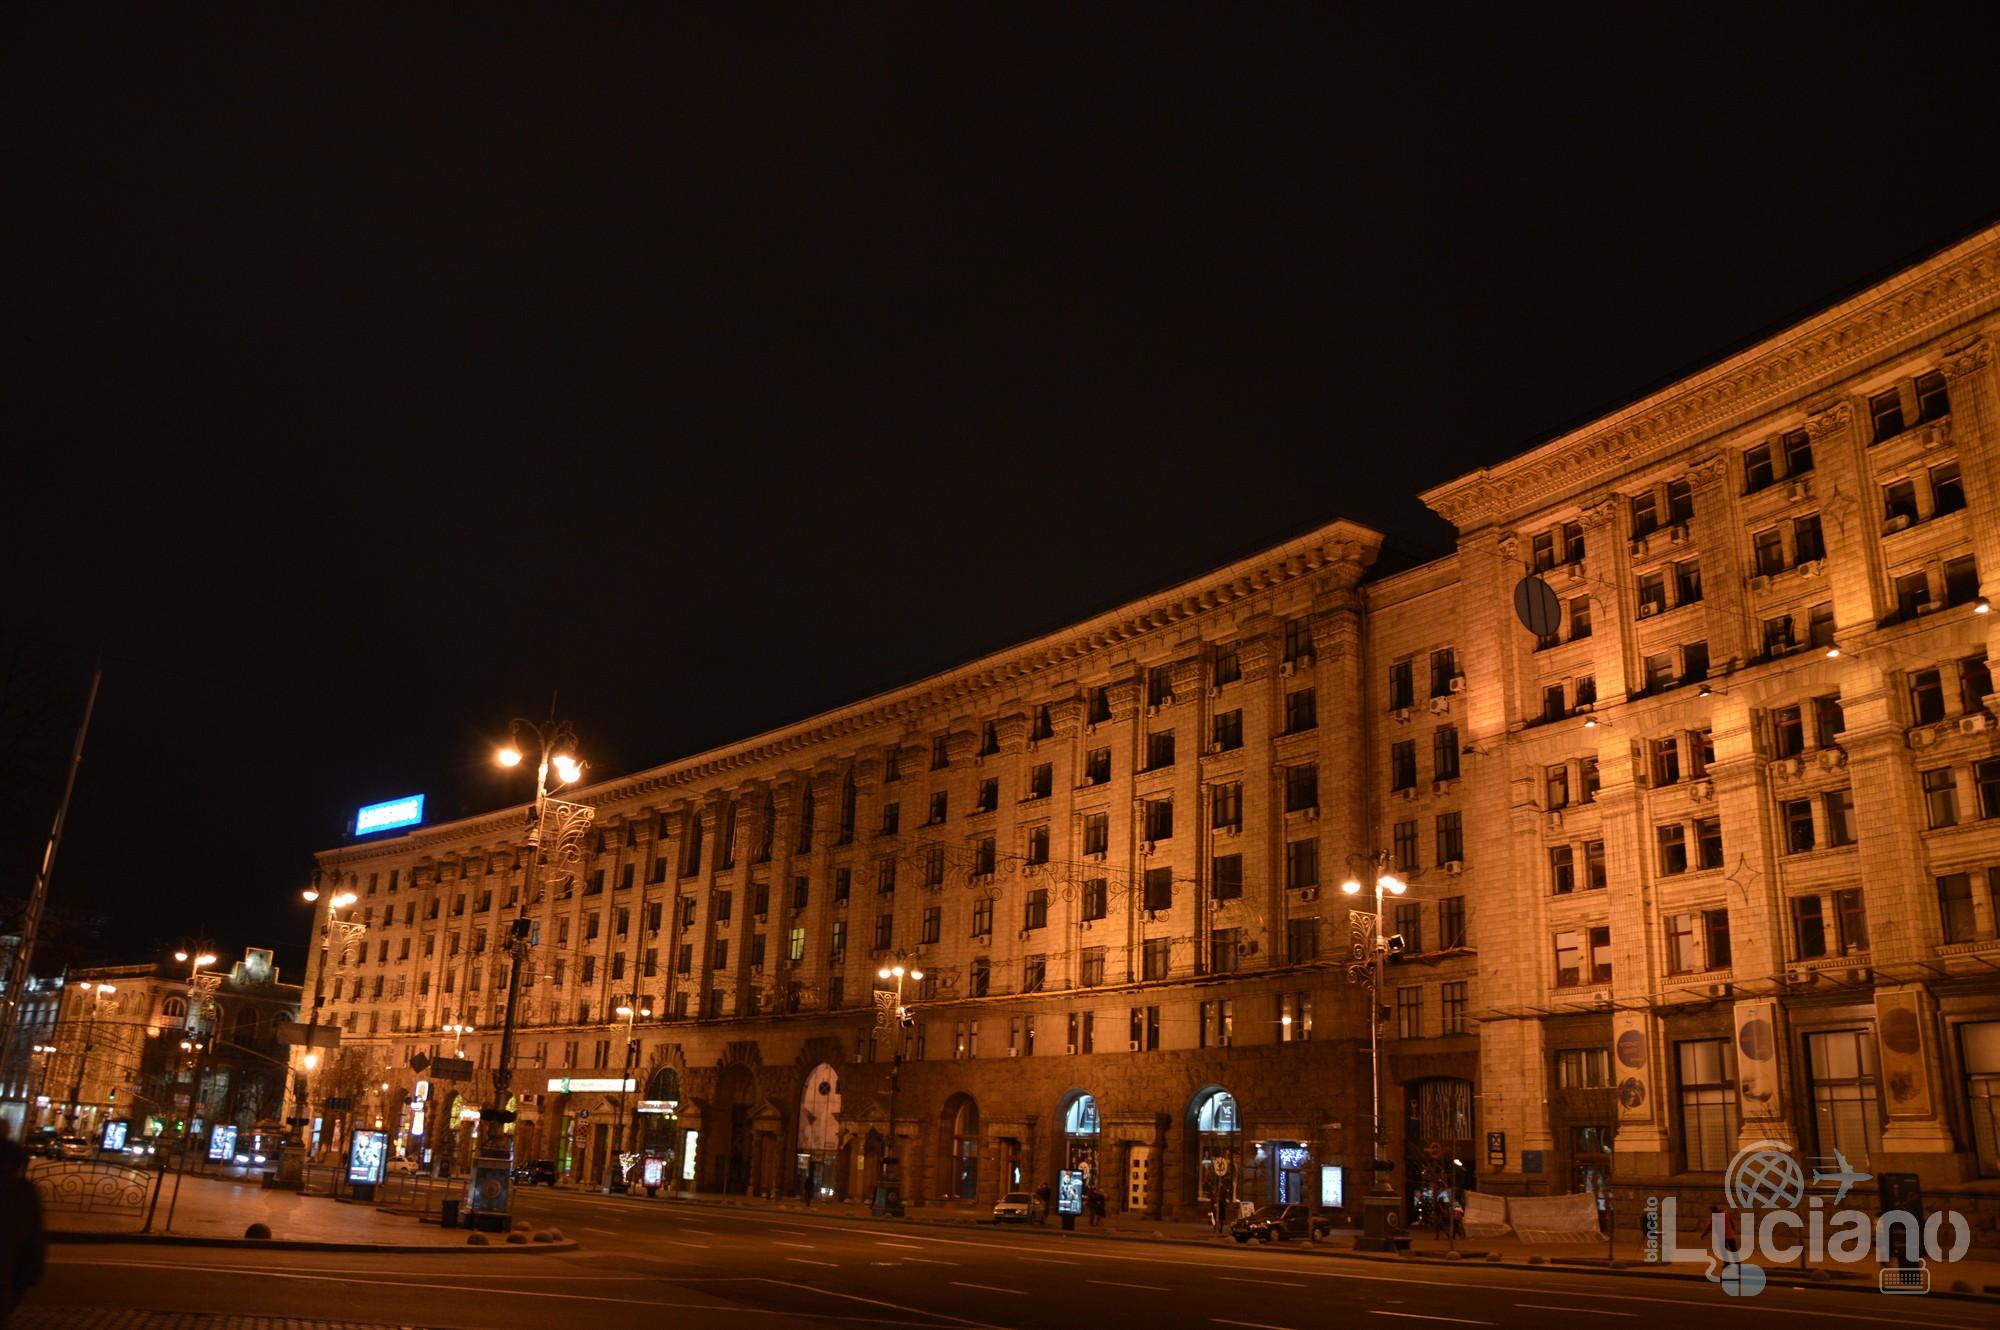 kiev-luciano-blancato-web-site (3)